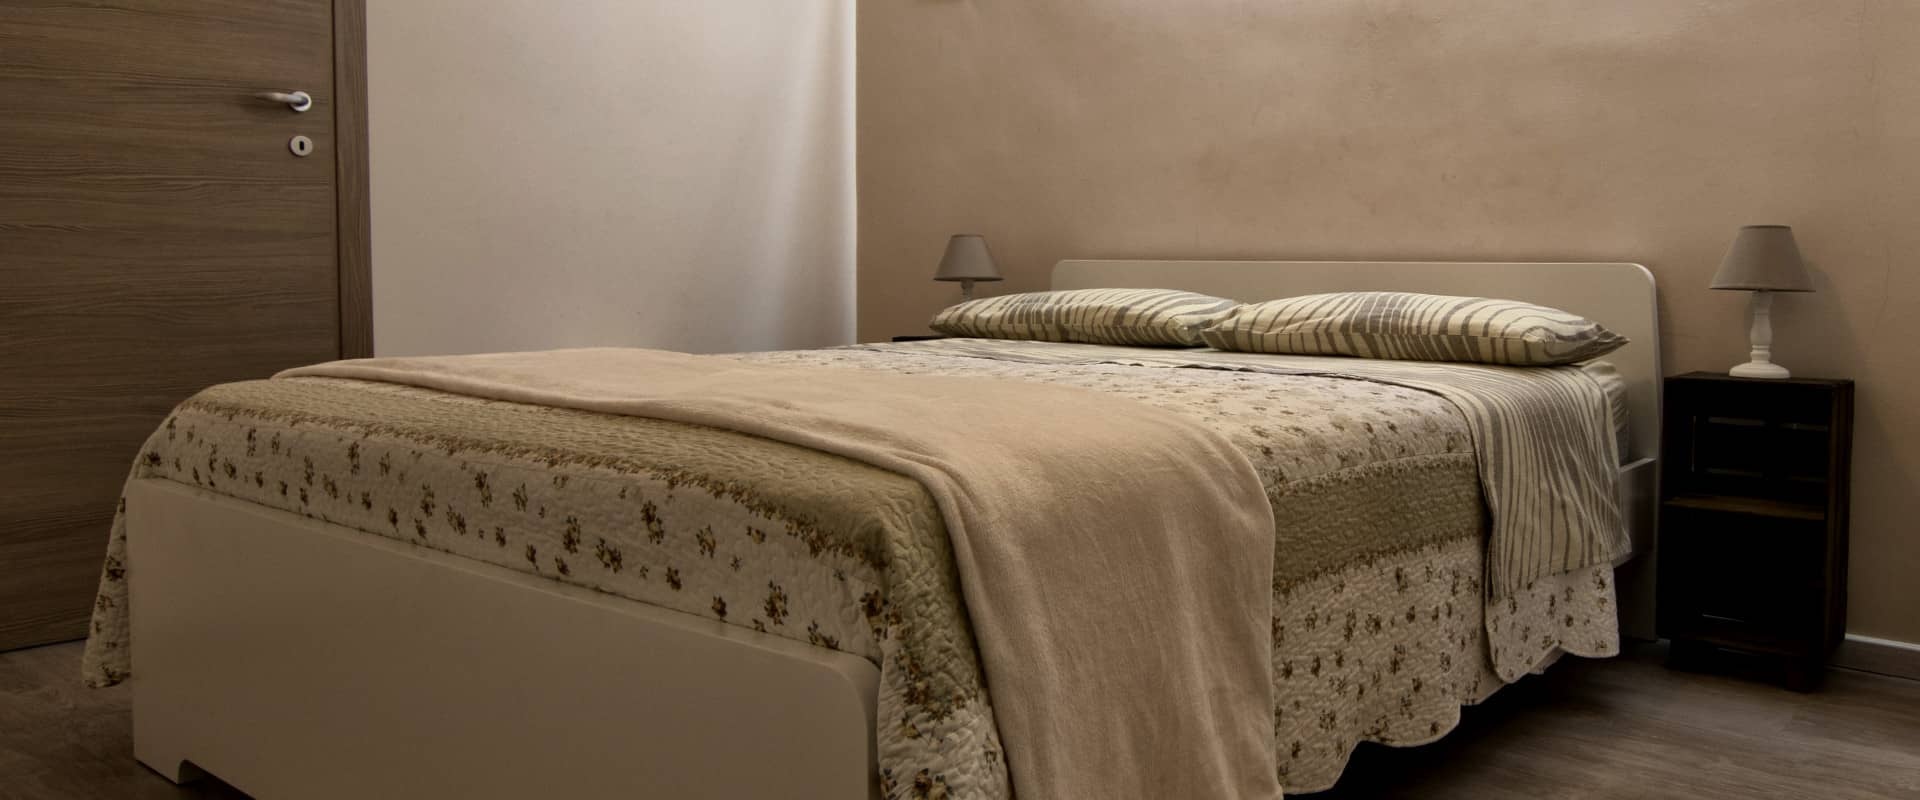 Bed & Breakfast Taranto